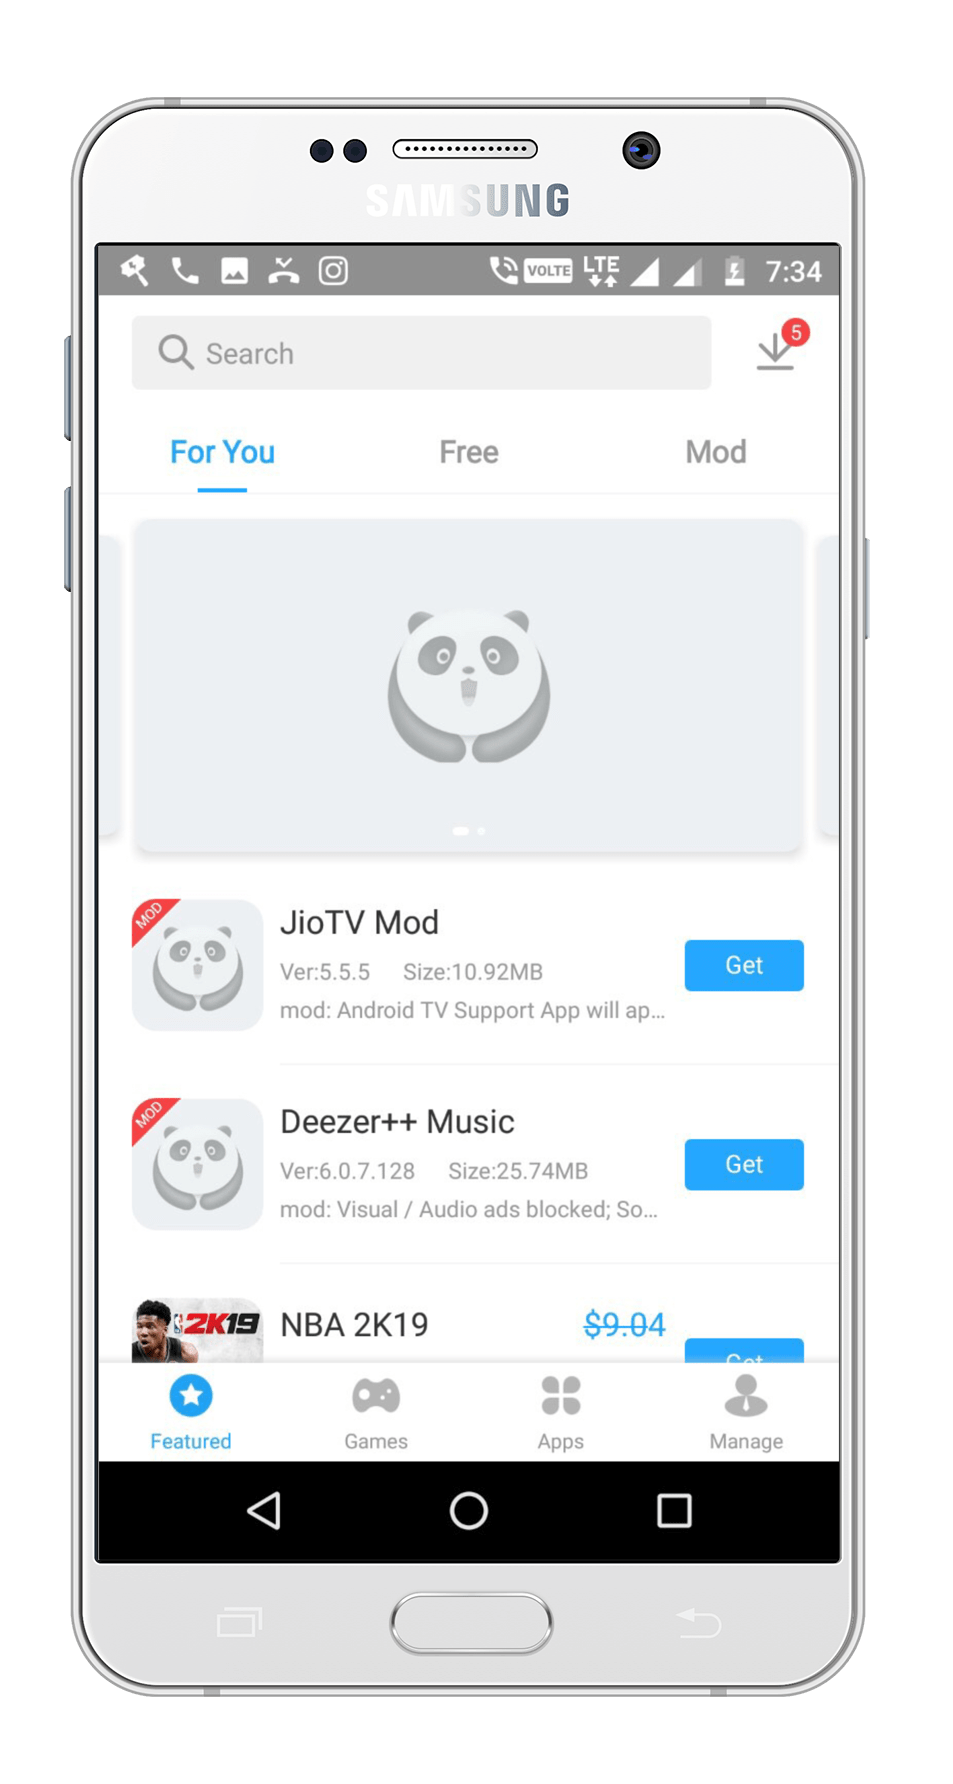 Panda Helper 2 Samsung-galaxynote5-white-landscape (7)